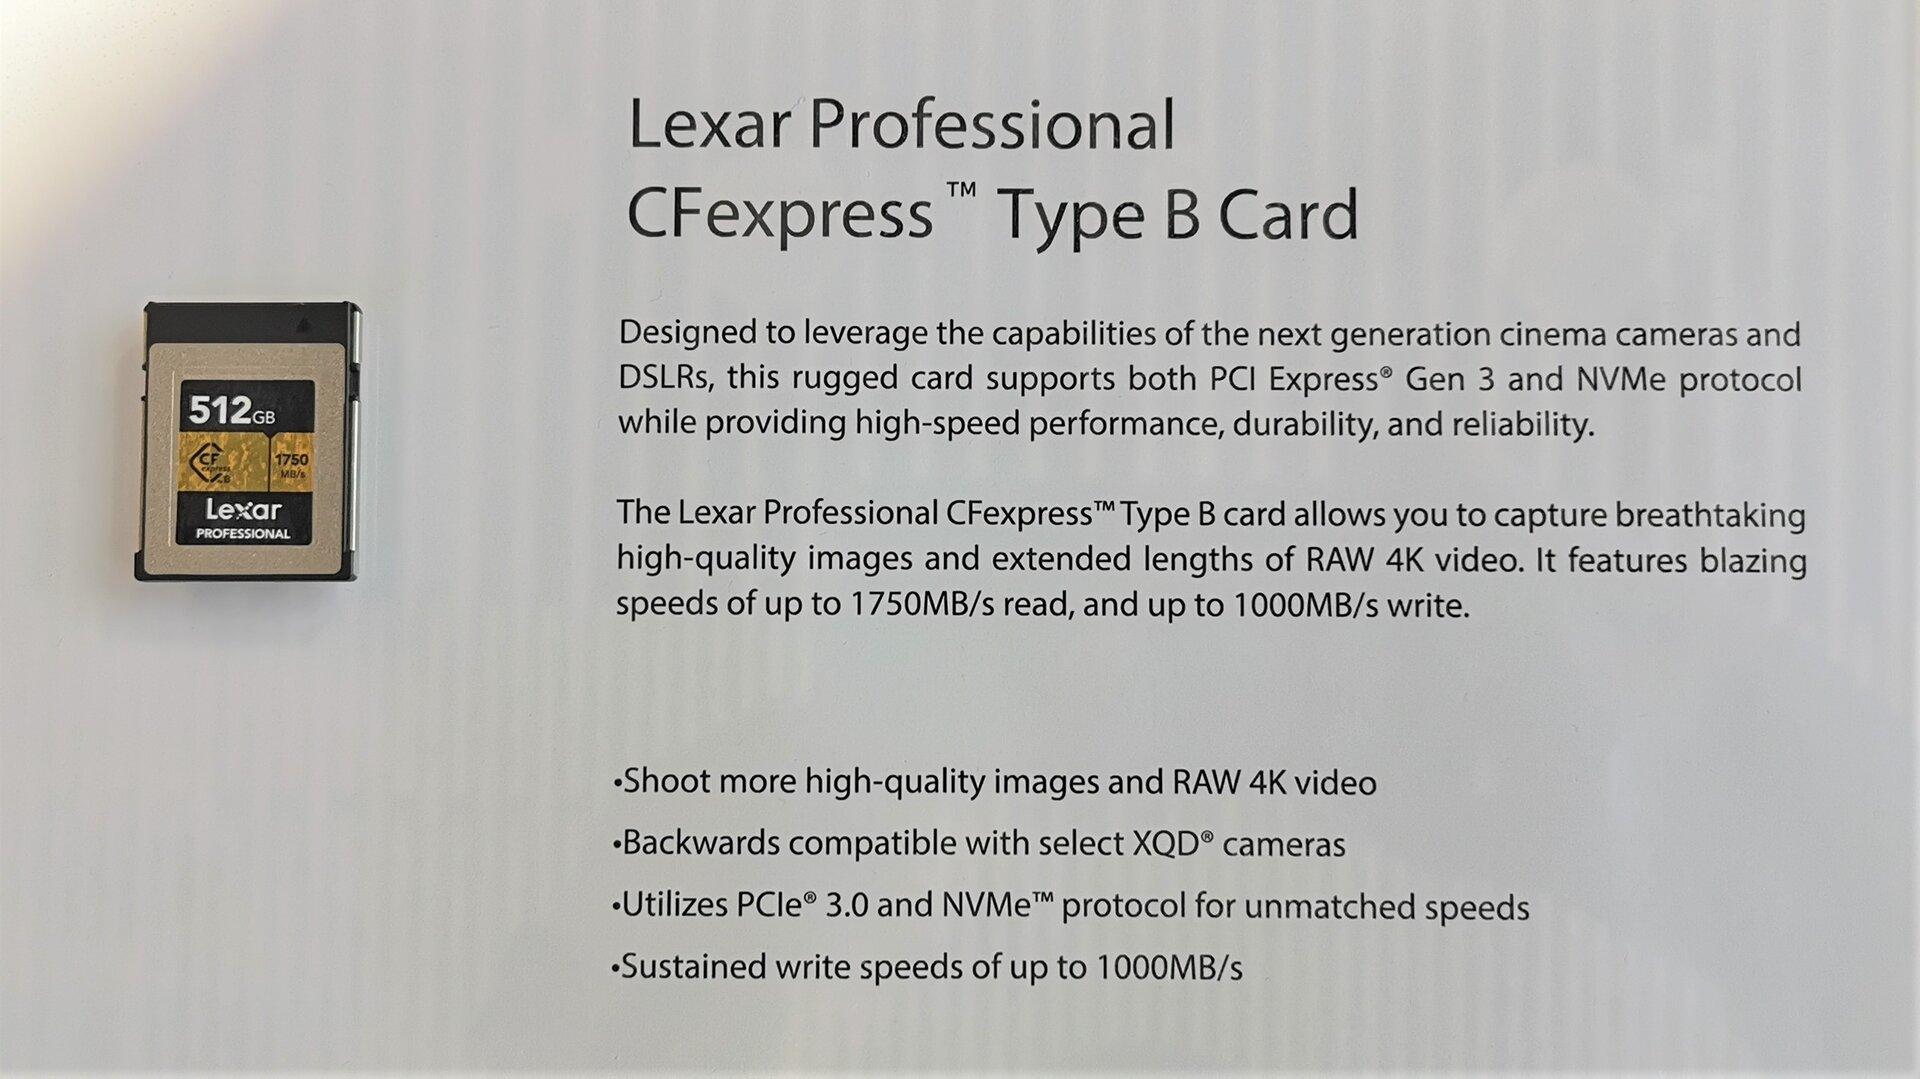 Lexar CFexpress Type B Card